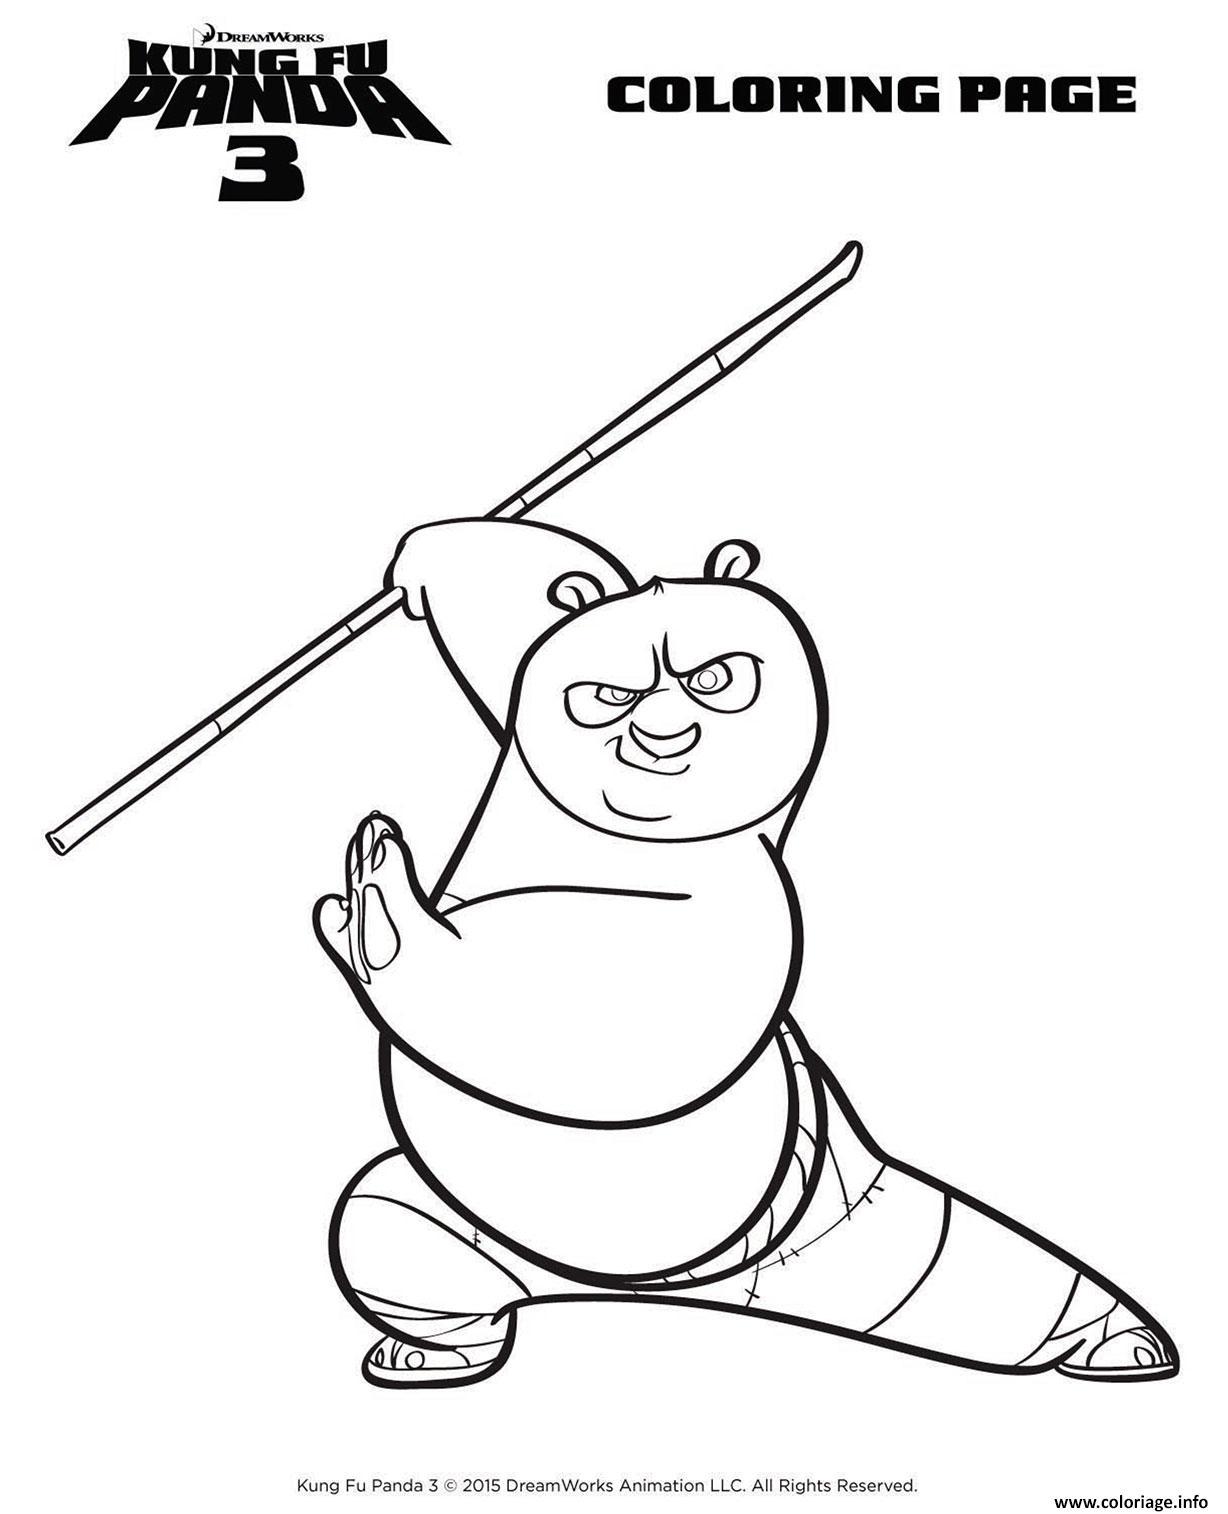 Coloriage kung fu panda 3 po 2016 dessin - Coloriage a imprimer kung fu panda ...